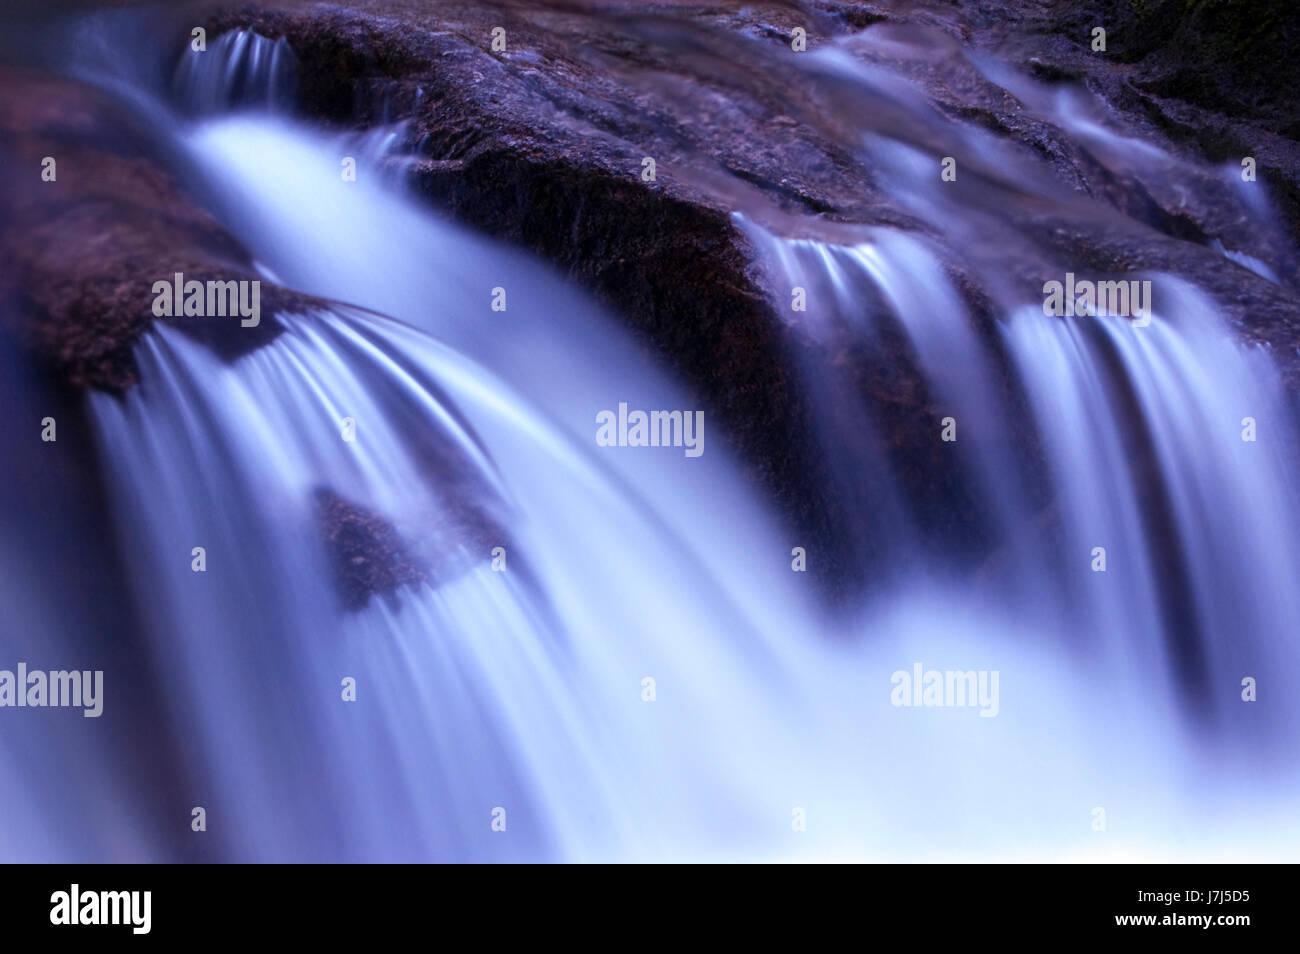 blue motion postponement moving movement shine shines bright lucent light - Stock Image